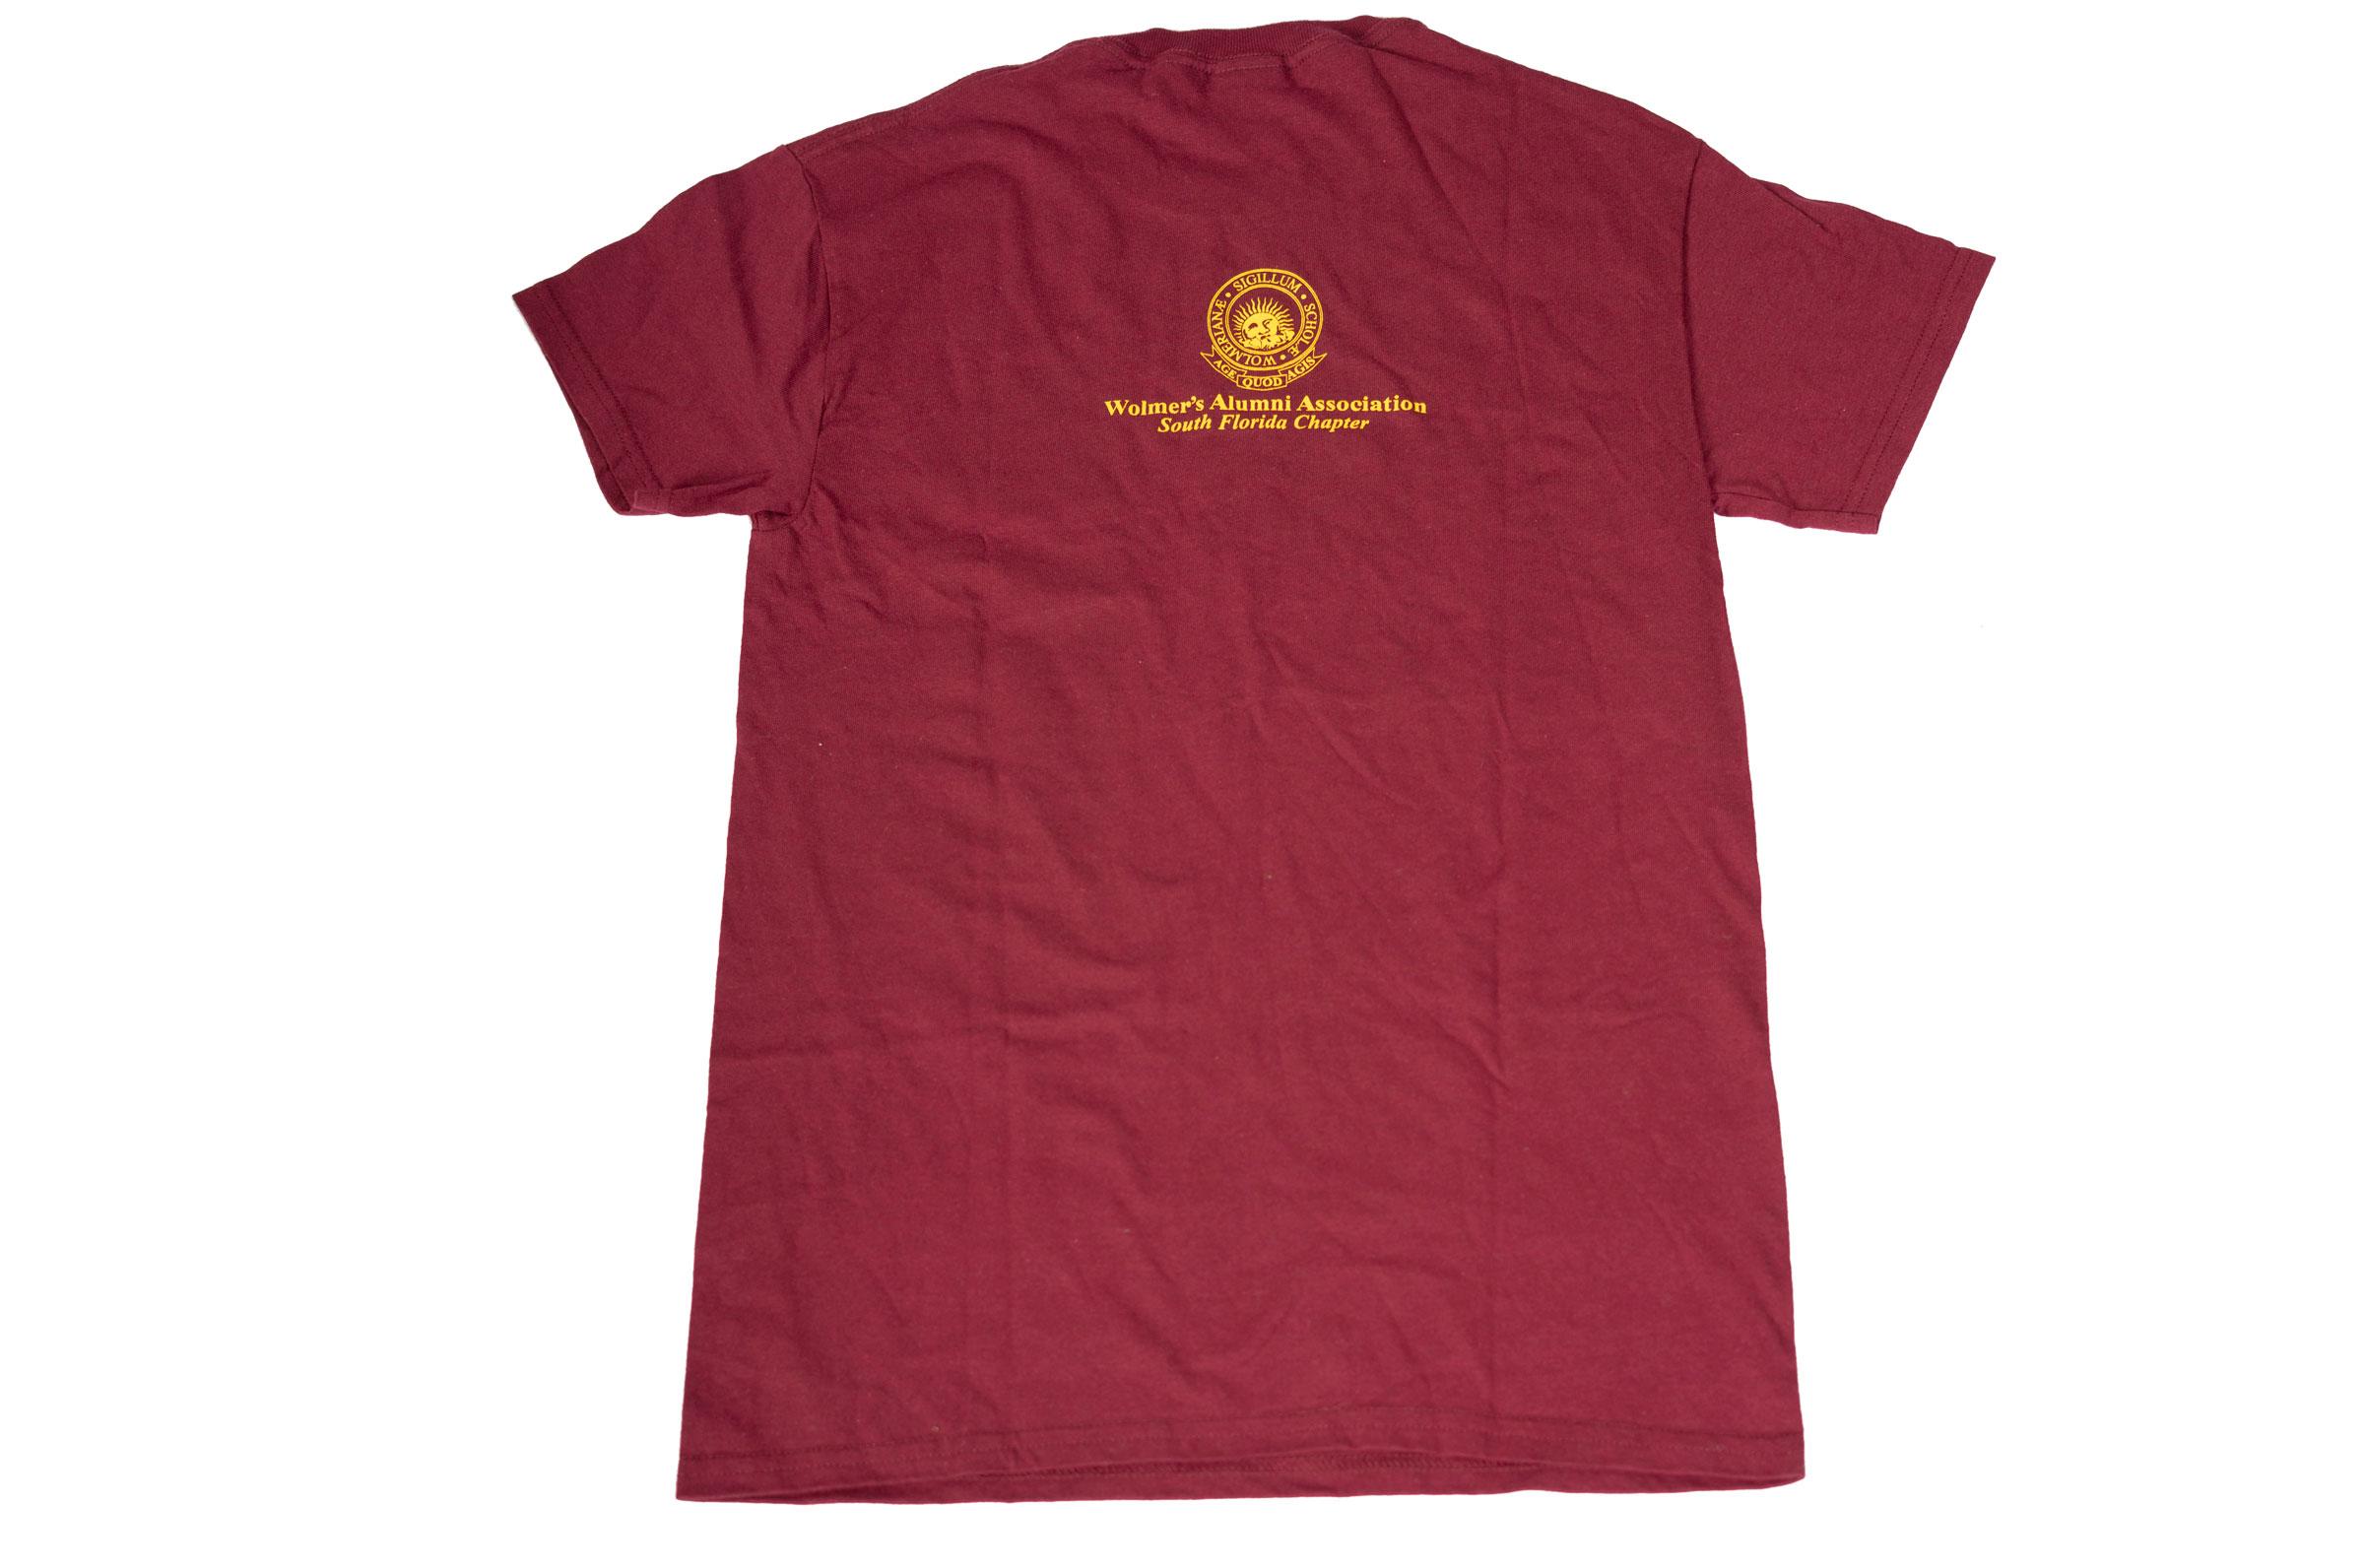 Wolmer's Cotton Tee Shirt Maroon